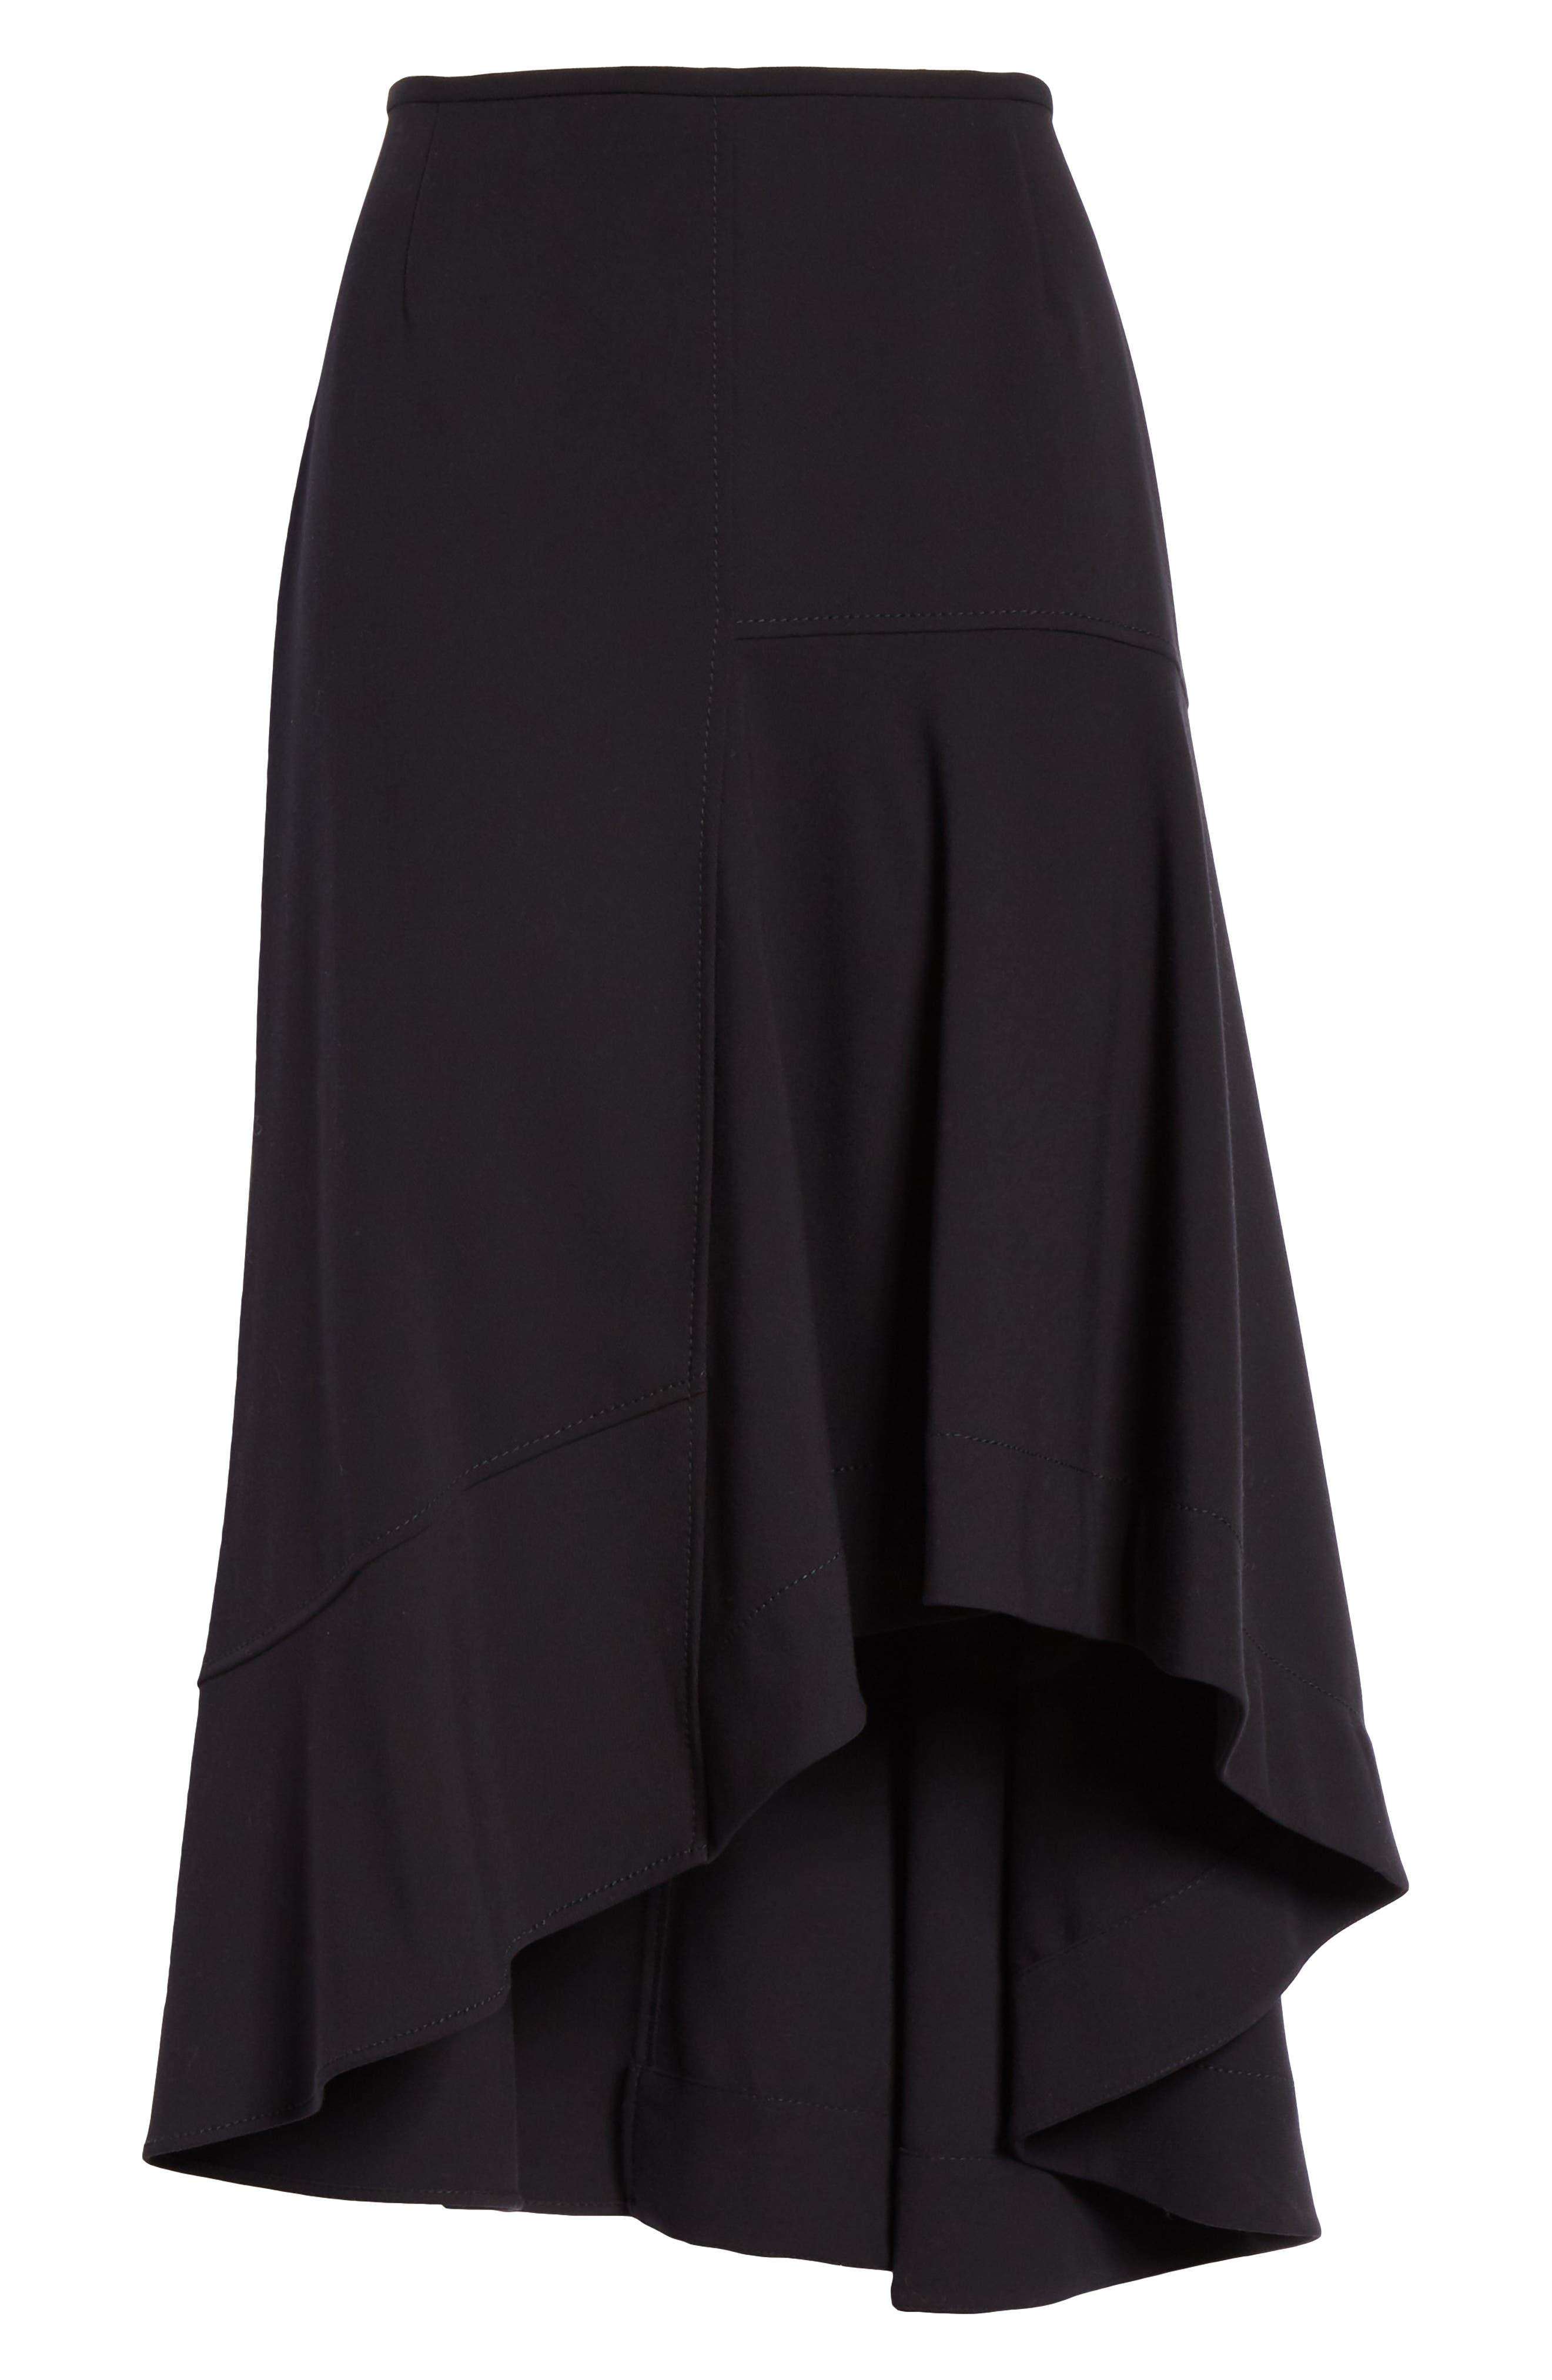 Melepia Asymmetrical Faux Wrap Skirt,                             Alternate thumbnail 6, color,                             NAVY